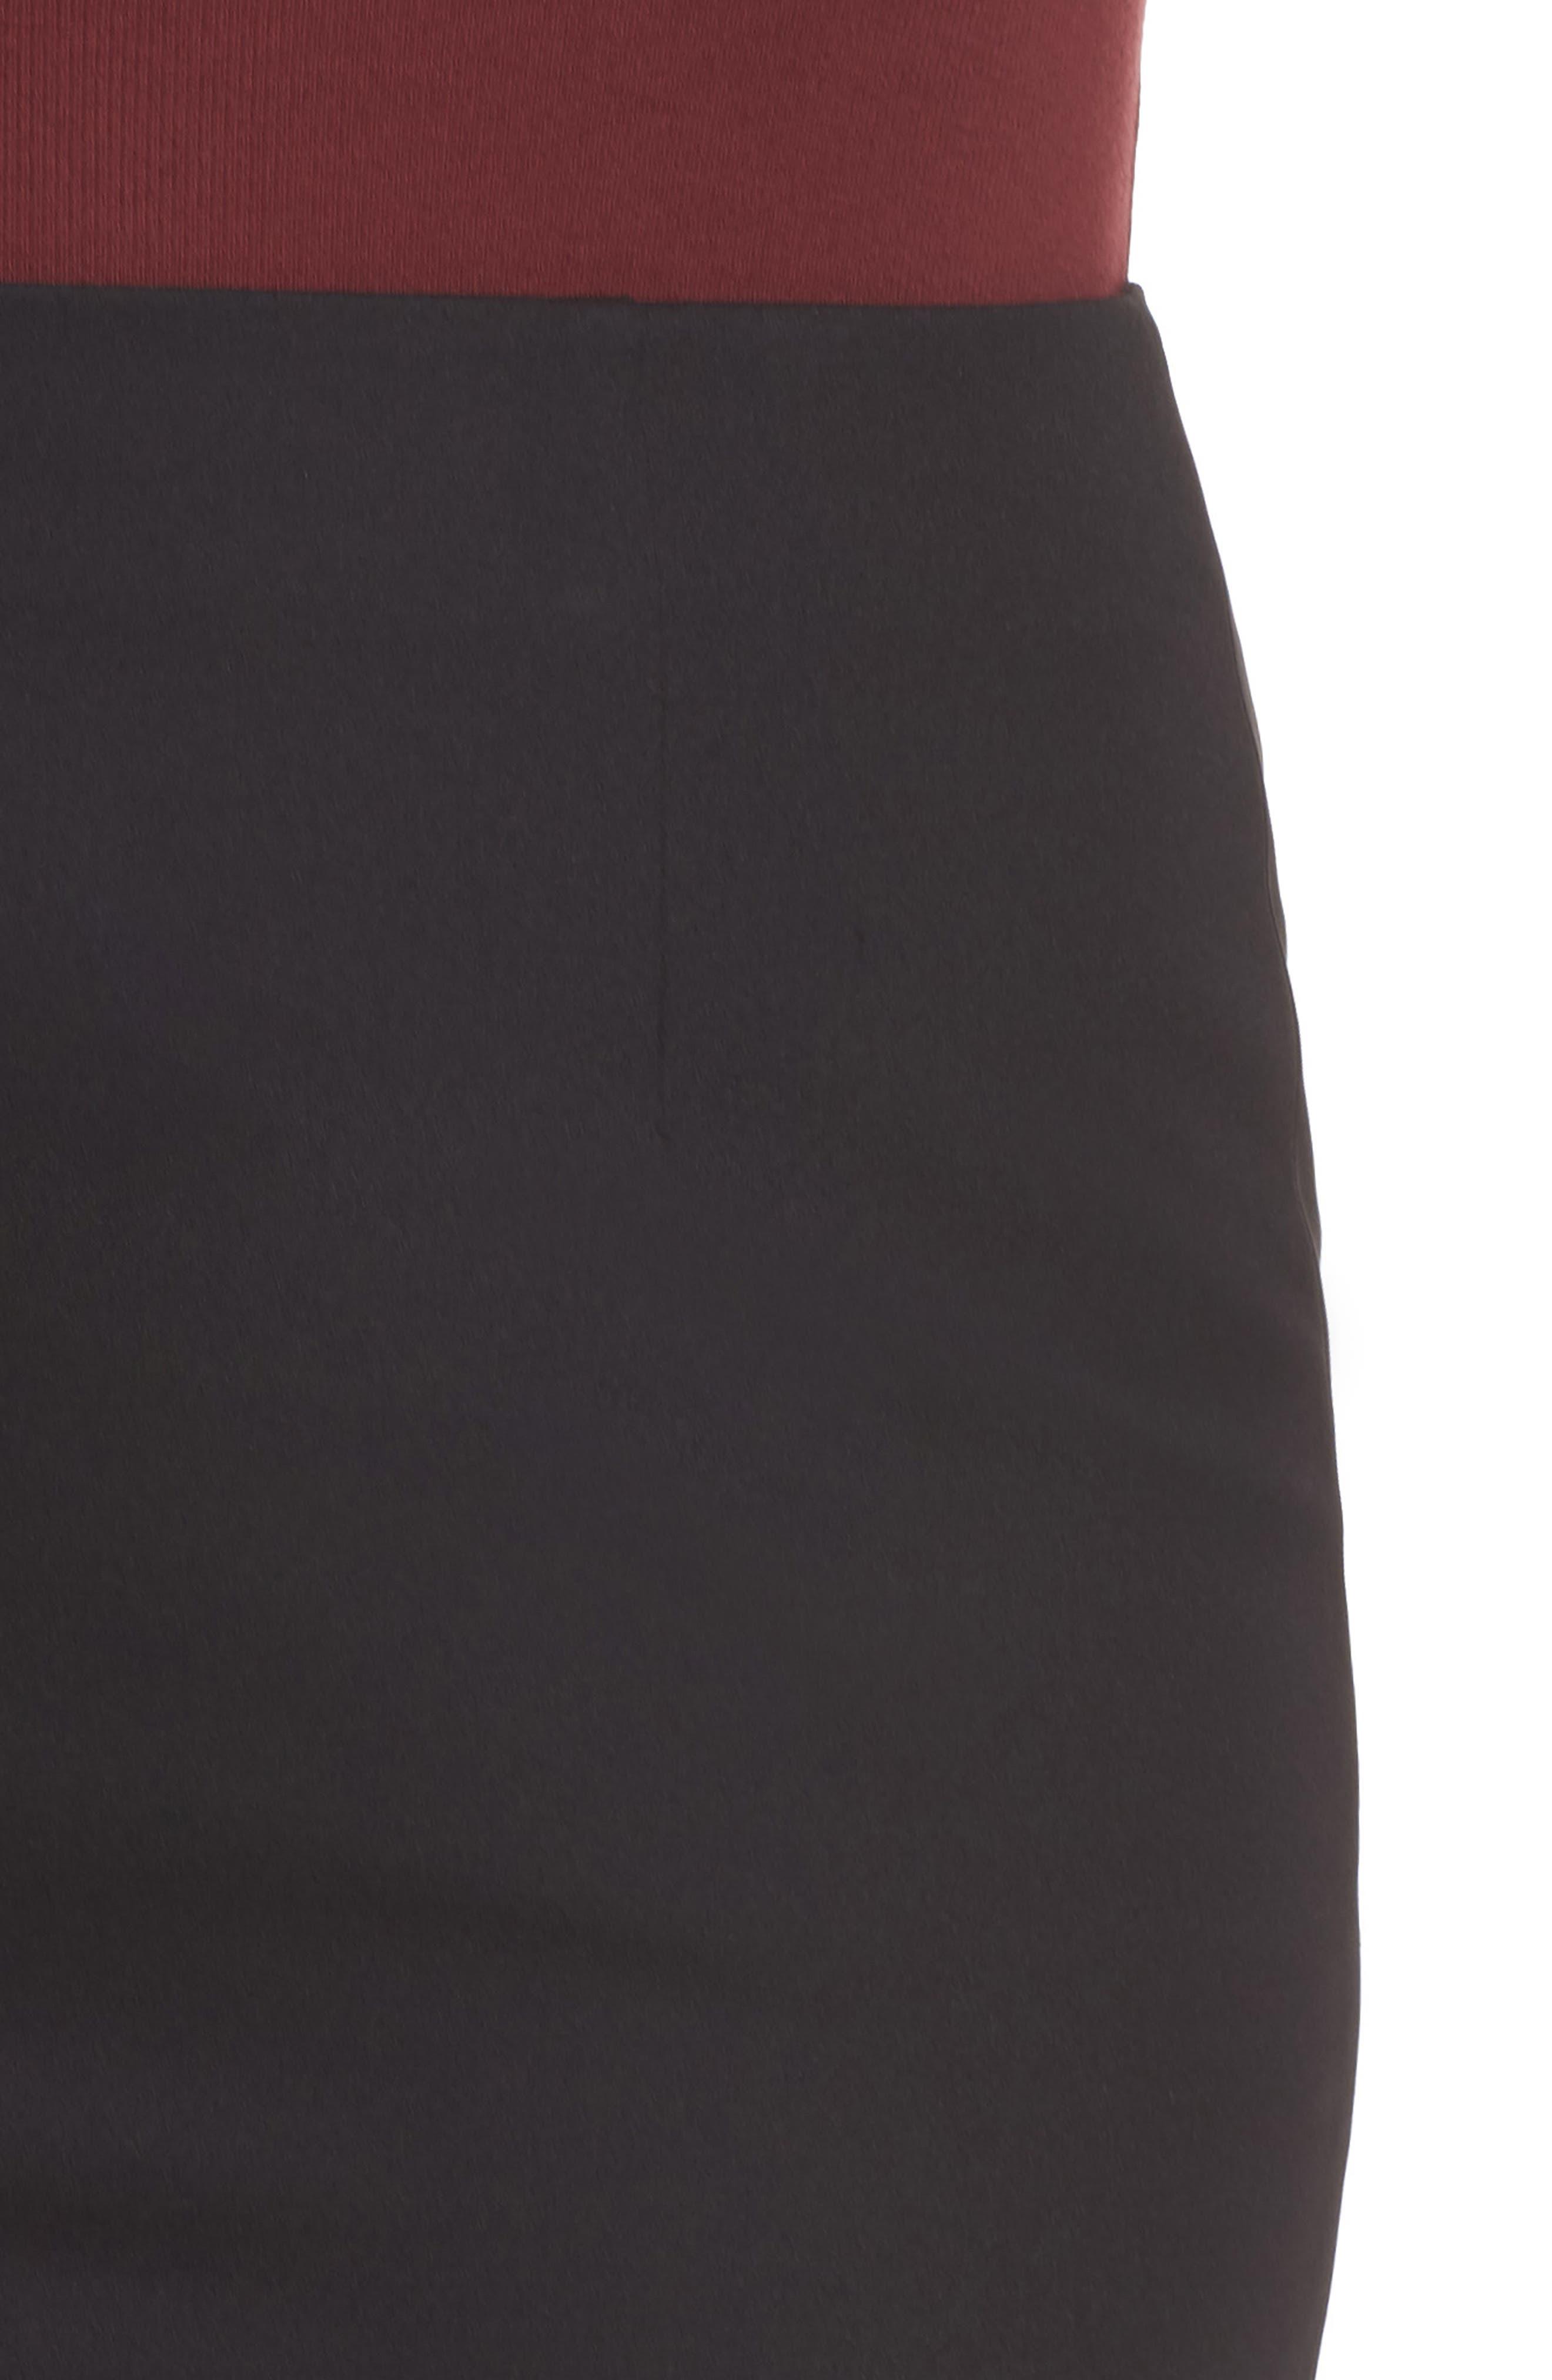 Pencil Skirt,                             Alternate thumbnail 10, color,                             BLACK